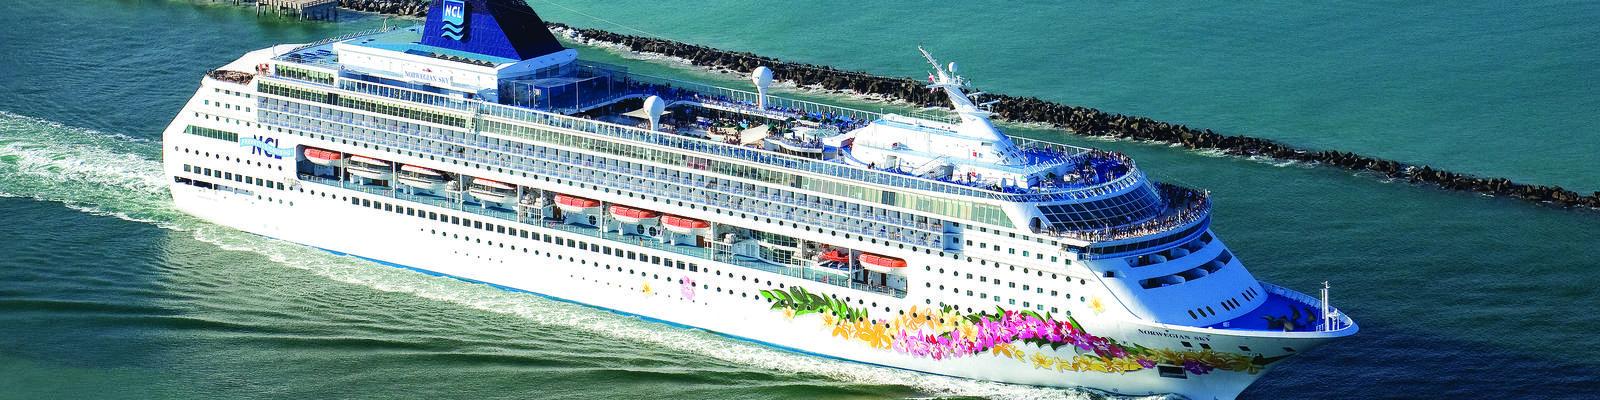 Norwegian Cruise Line to Eliminate Shipwide Open Bar on Norwegian Sky and Norwegian Sun